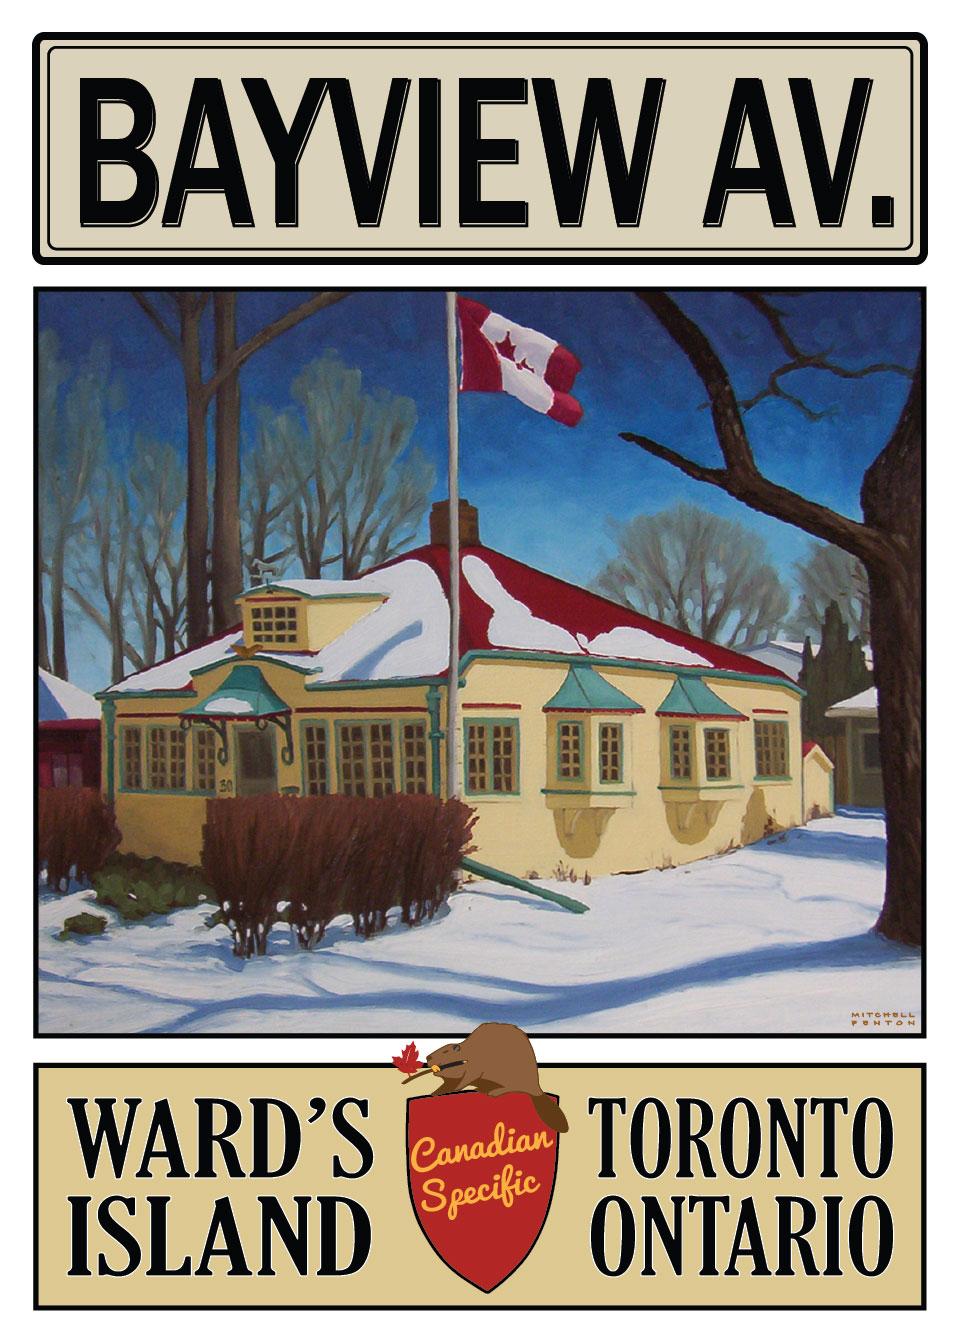 30 Bayview Ave, Toronto Island